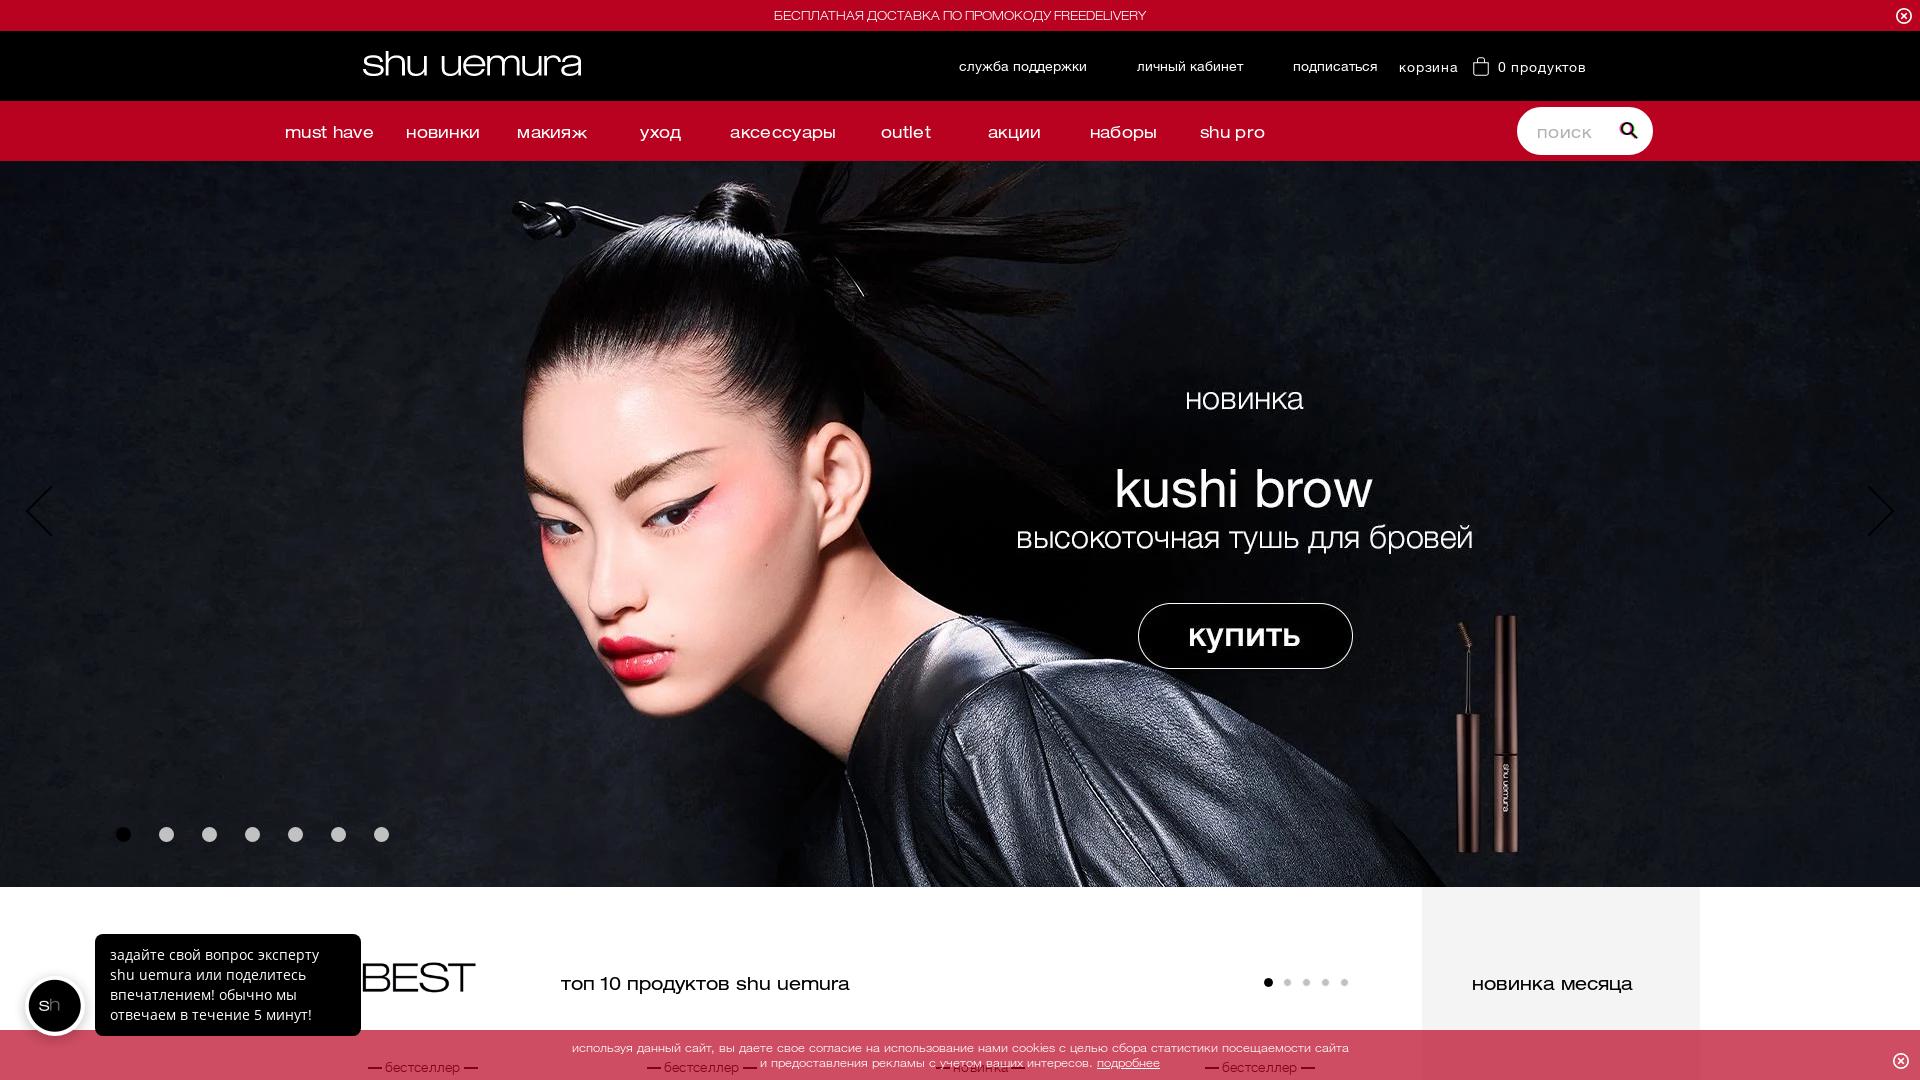 Shuuemura website